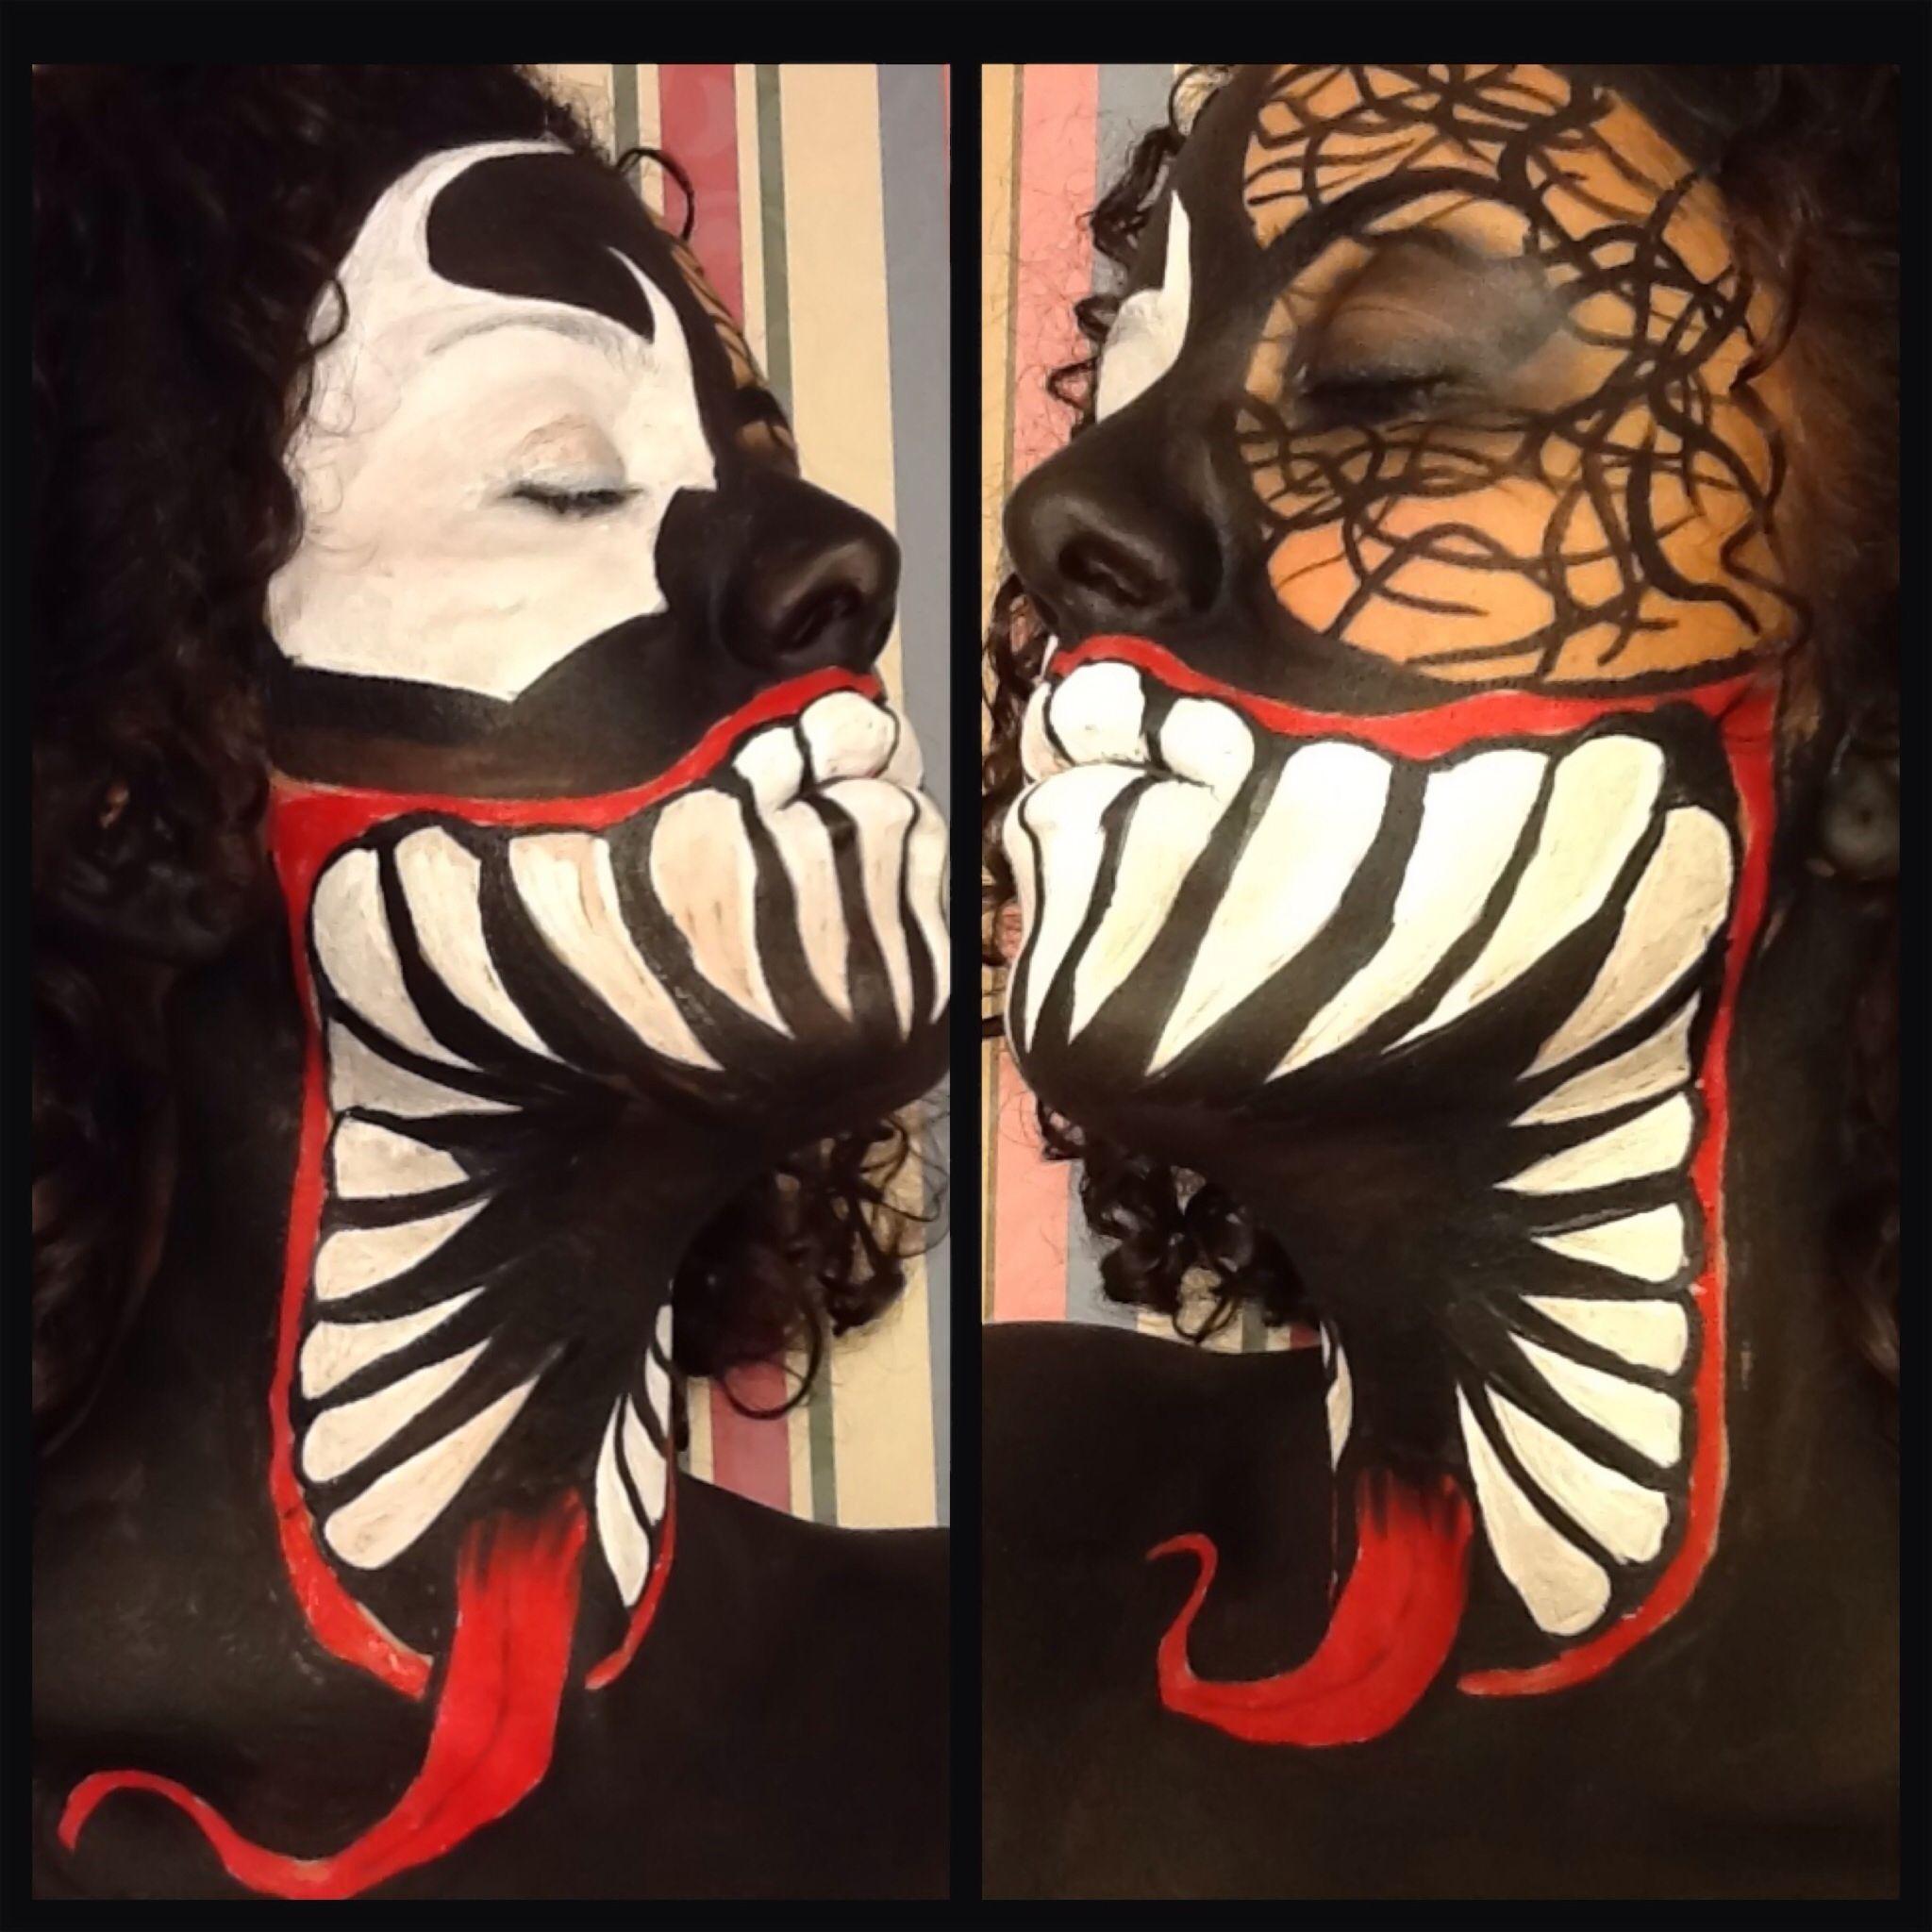 Venom face paint using wolfe brothers paint lizfloresmua venom face paint using wolfe brothers paint lizfloresmua ig colorjunkieliz baditri Images